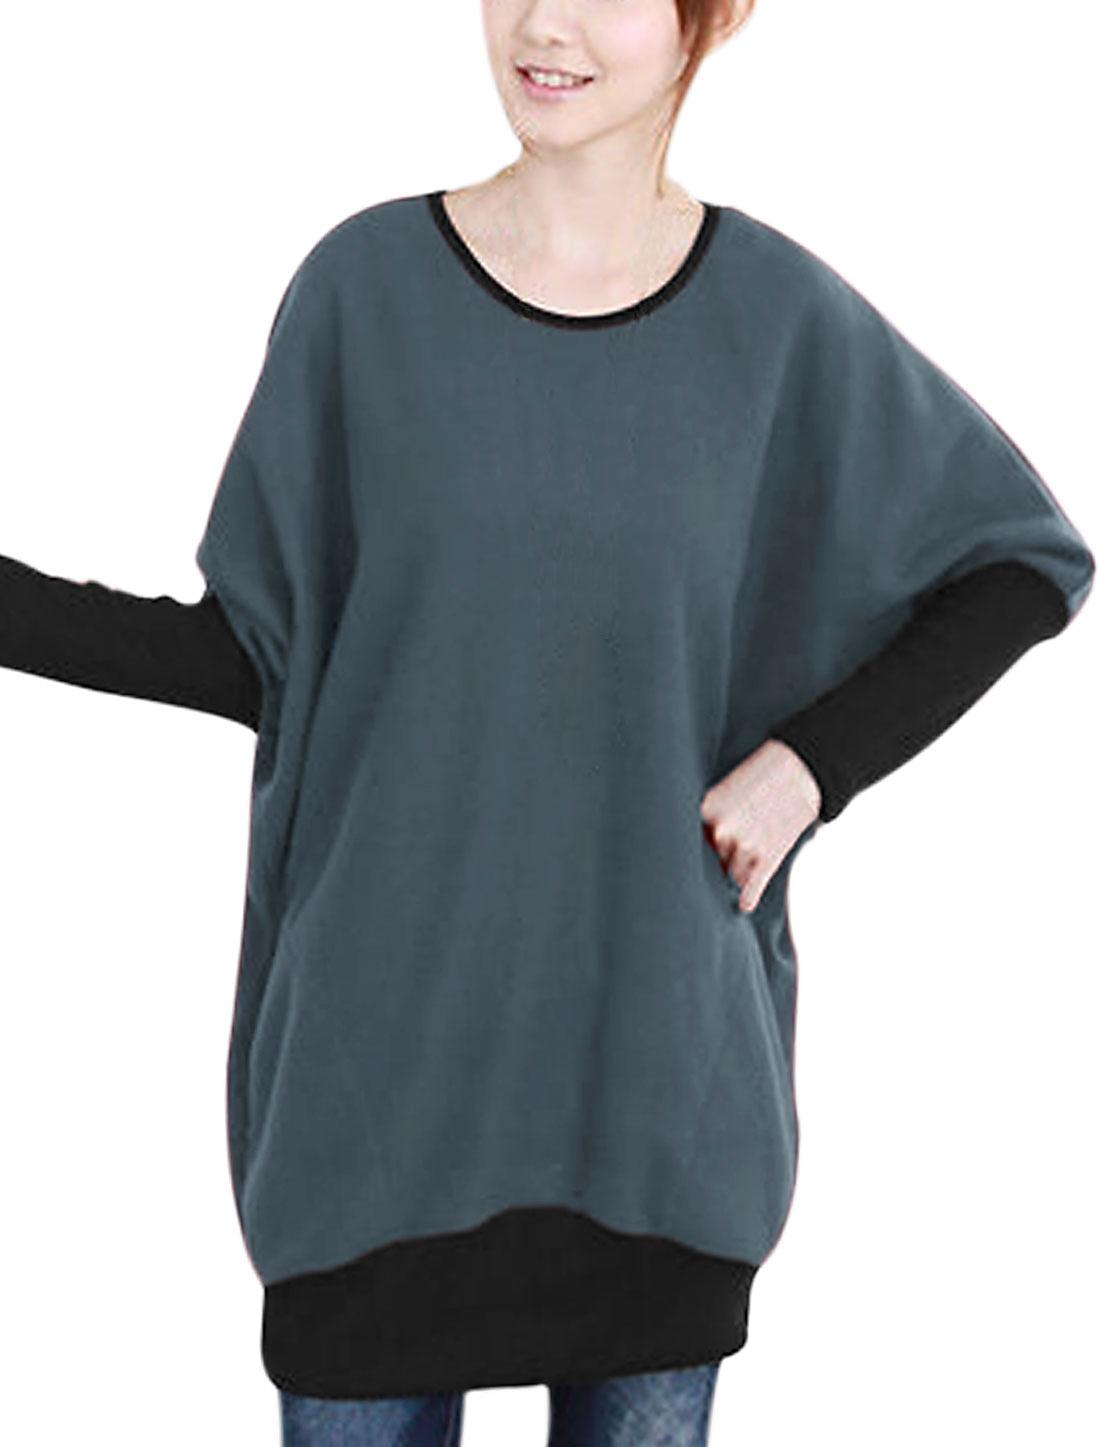 Women Long Sleeves Round Neck Fleece Leisure Tunic Top Dark Gray Black S